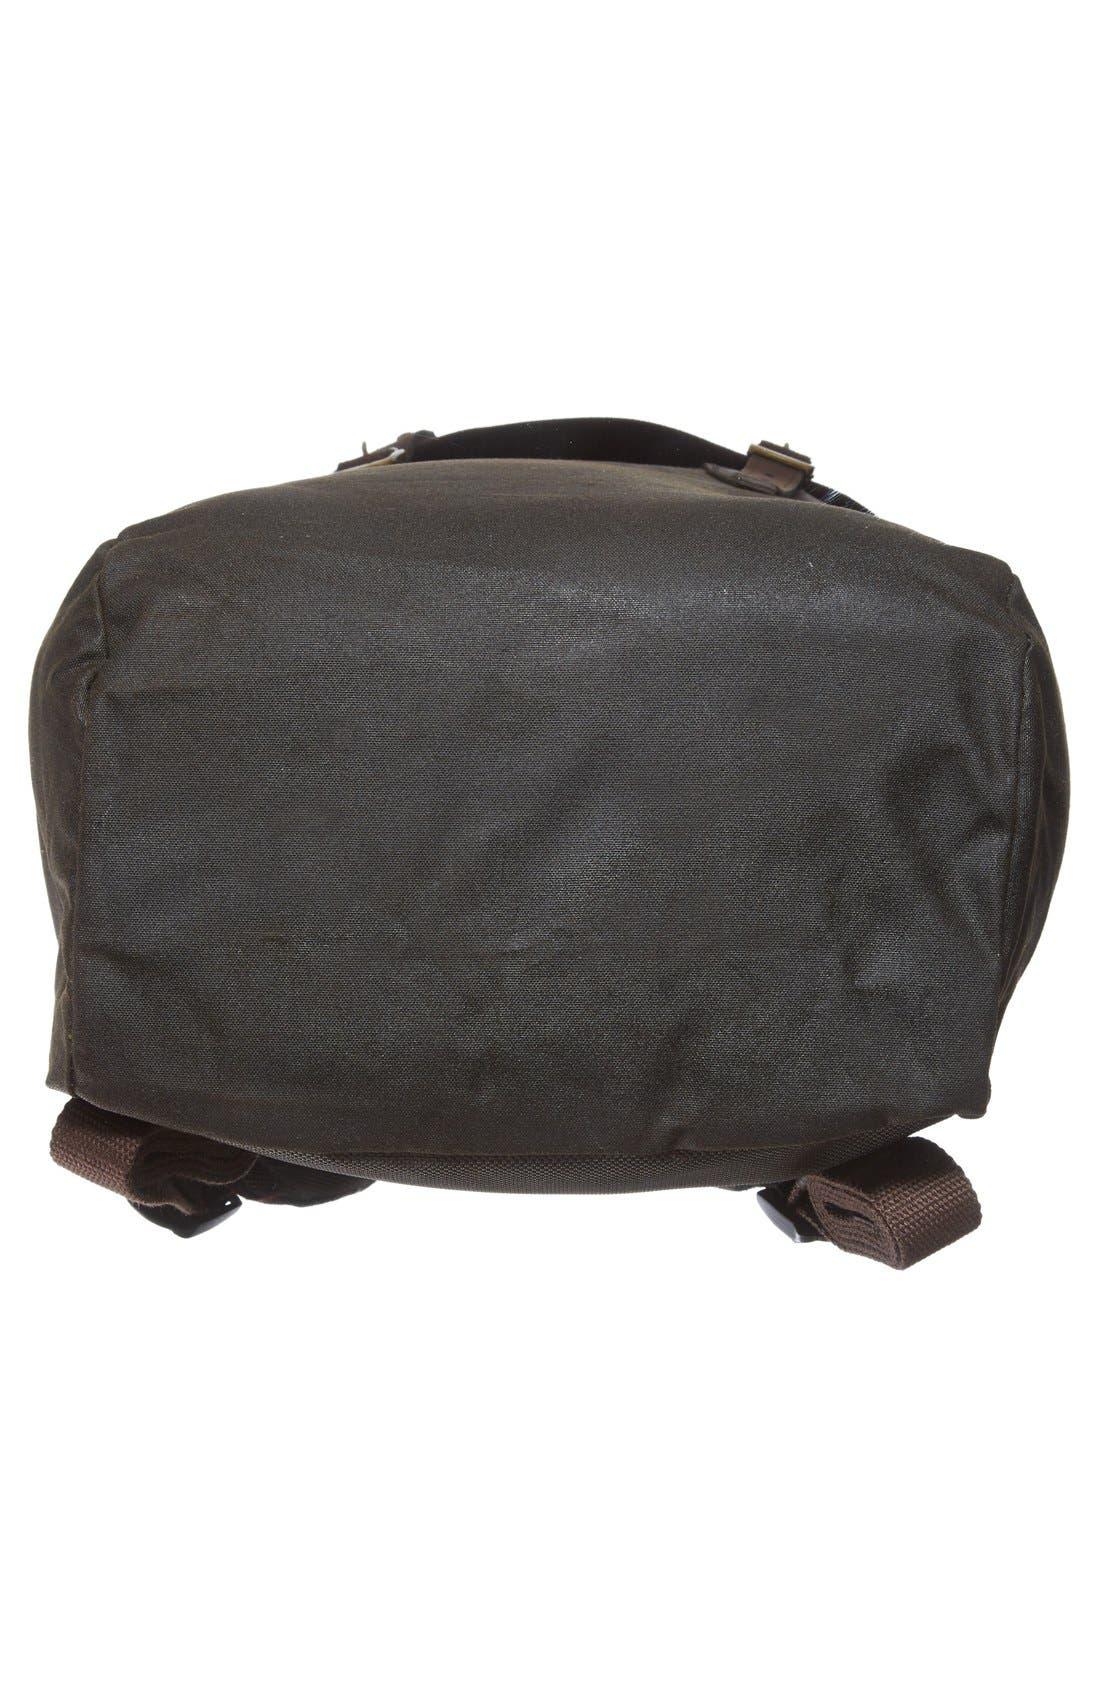 Waxed Canvas Backpack,                             Alternate thumbnail 5, color,                             300